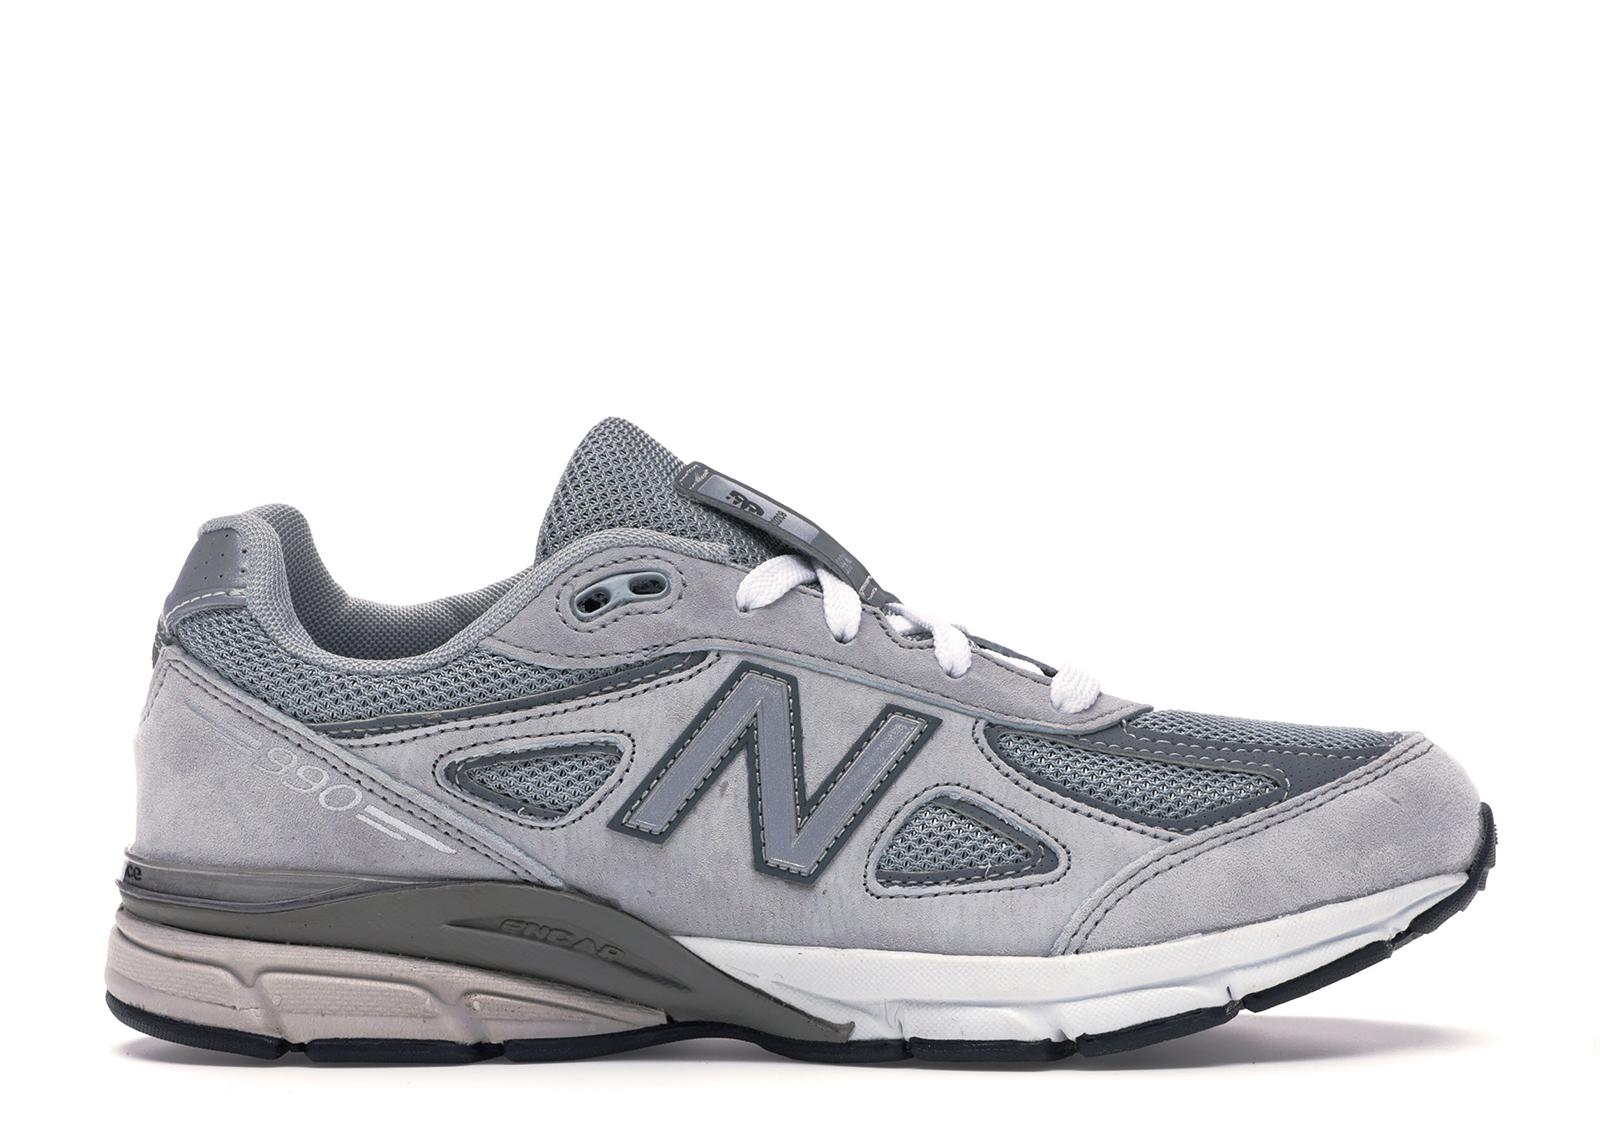 new balance 990v4 price